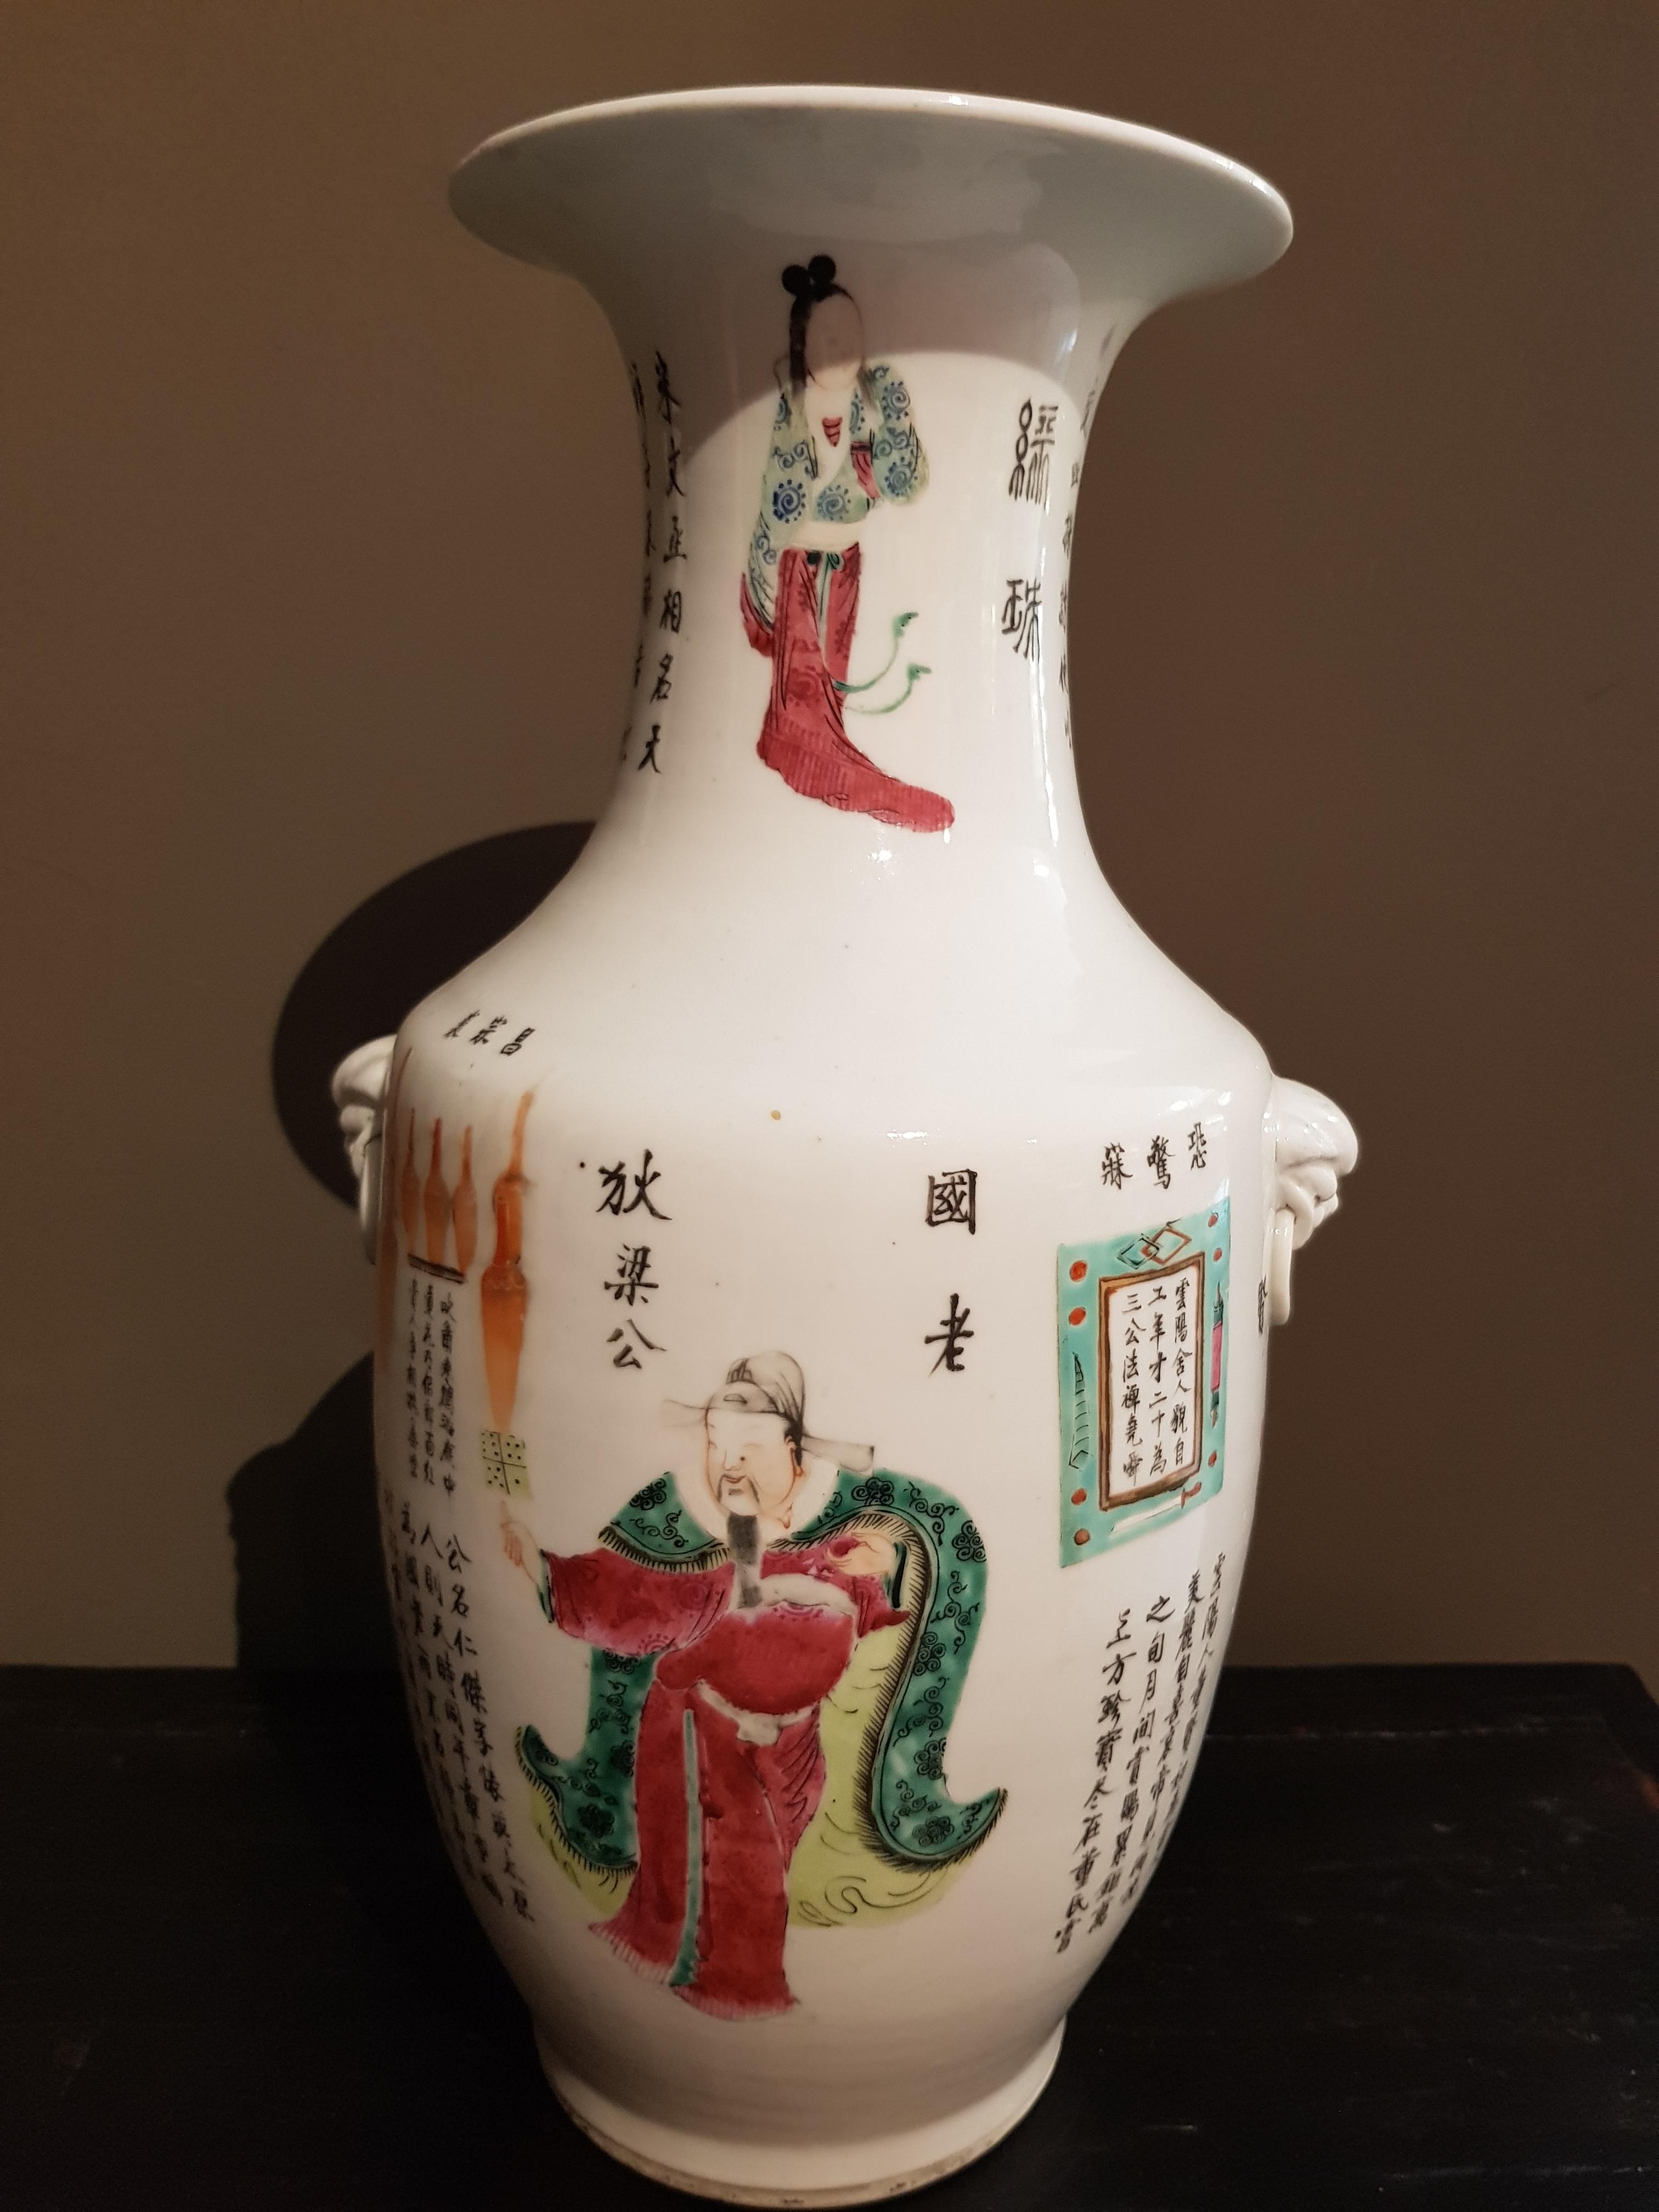 Vase Wu Shuang Pu - Chine - VENDU Image